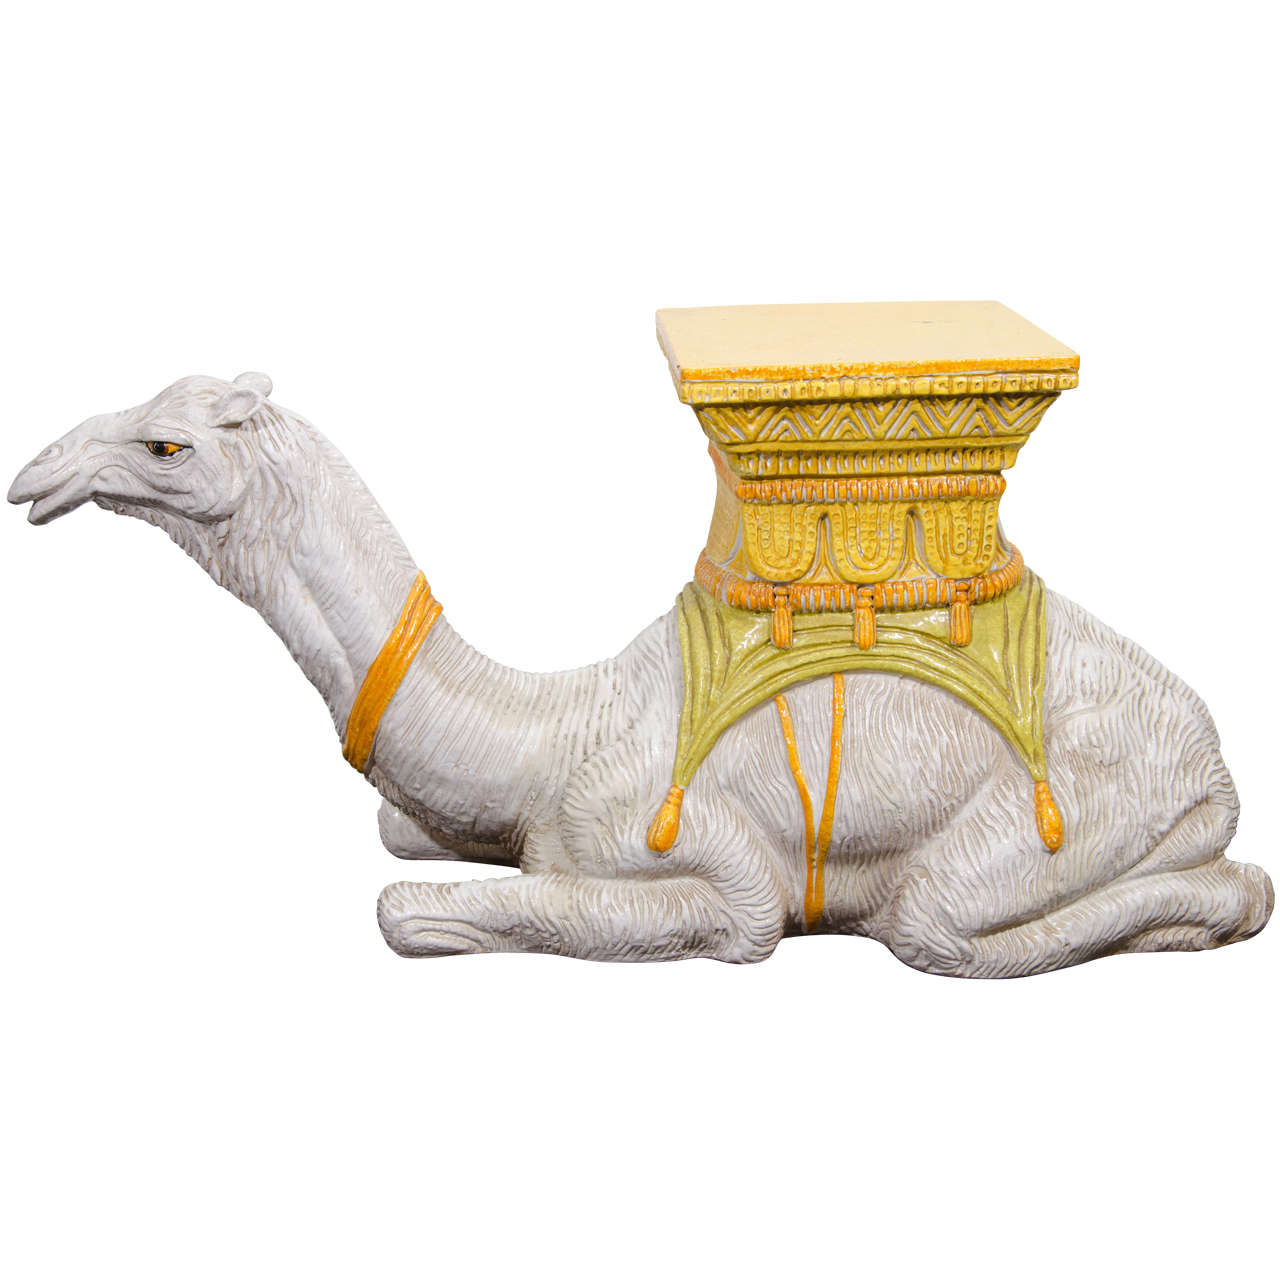 Midcentury Highly Decorative Italian Ceramic Camel Form